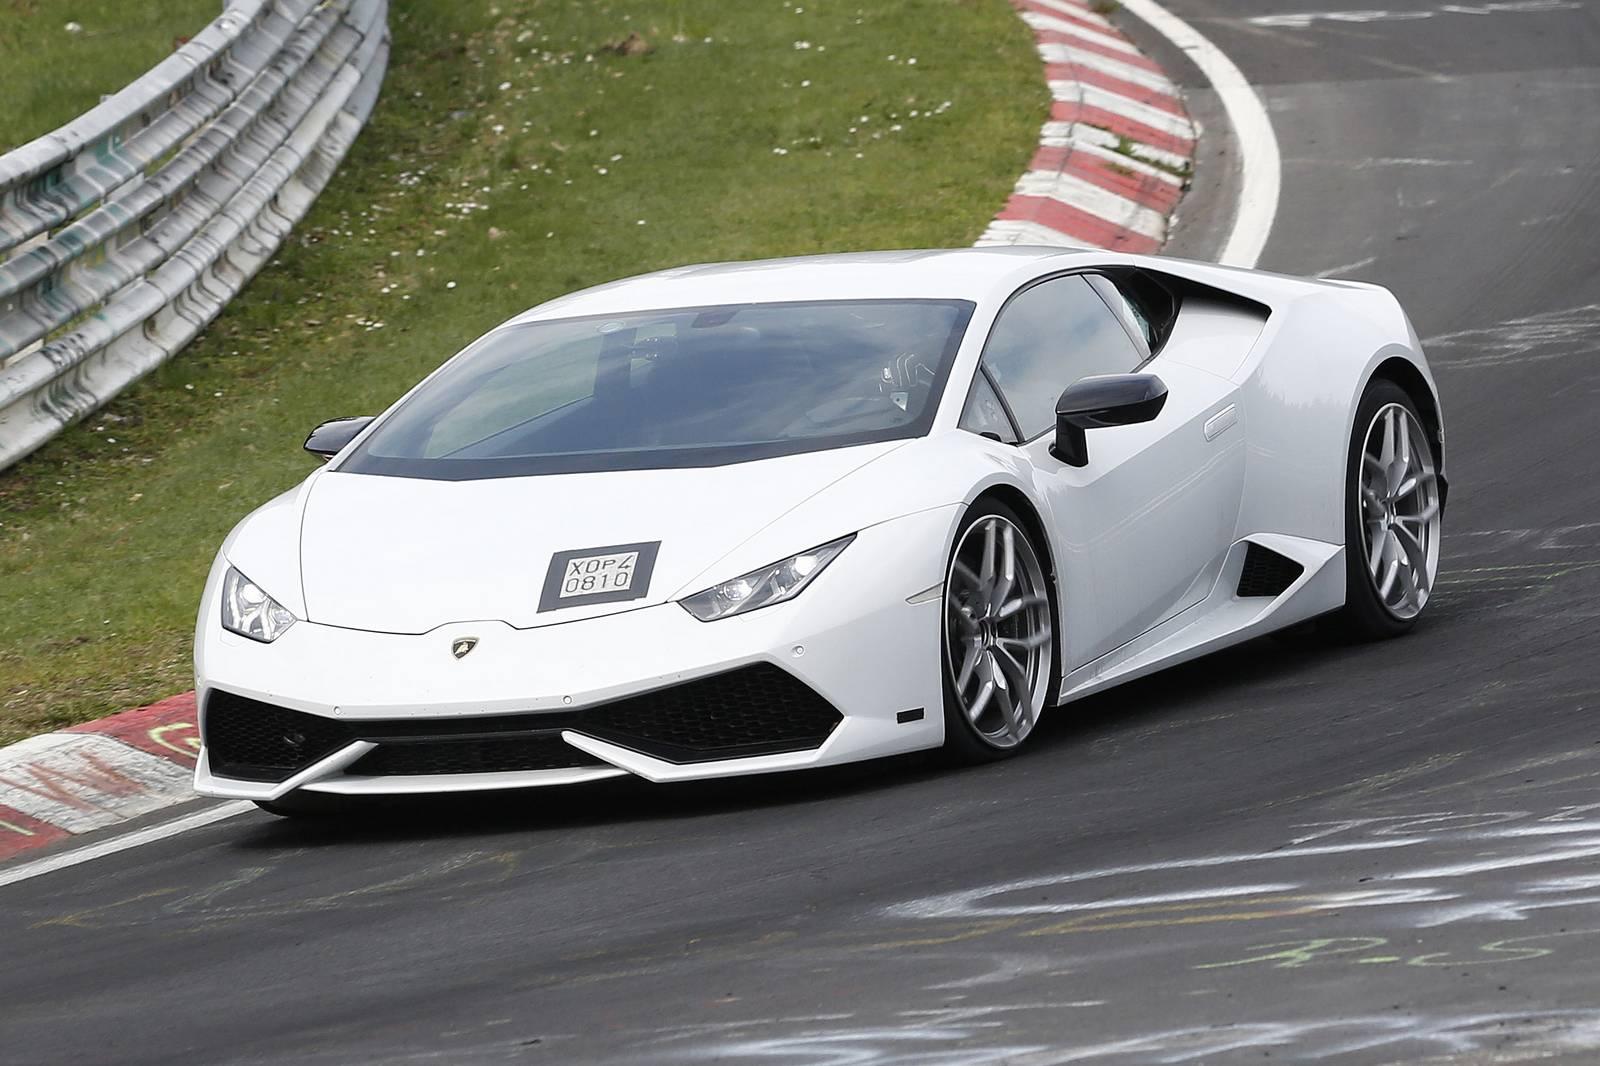 Lamborghini вывел на тесты специальный выпуск Huracan Superleggera 1